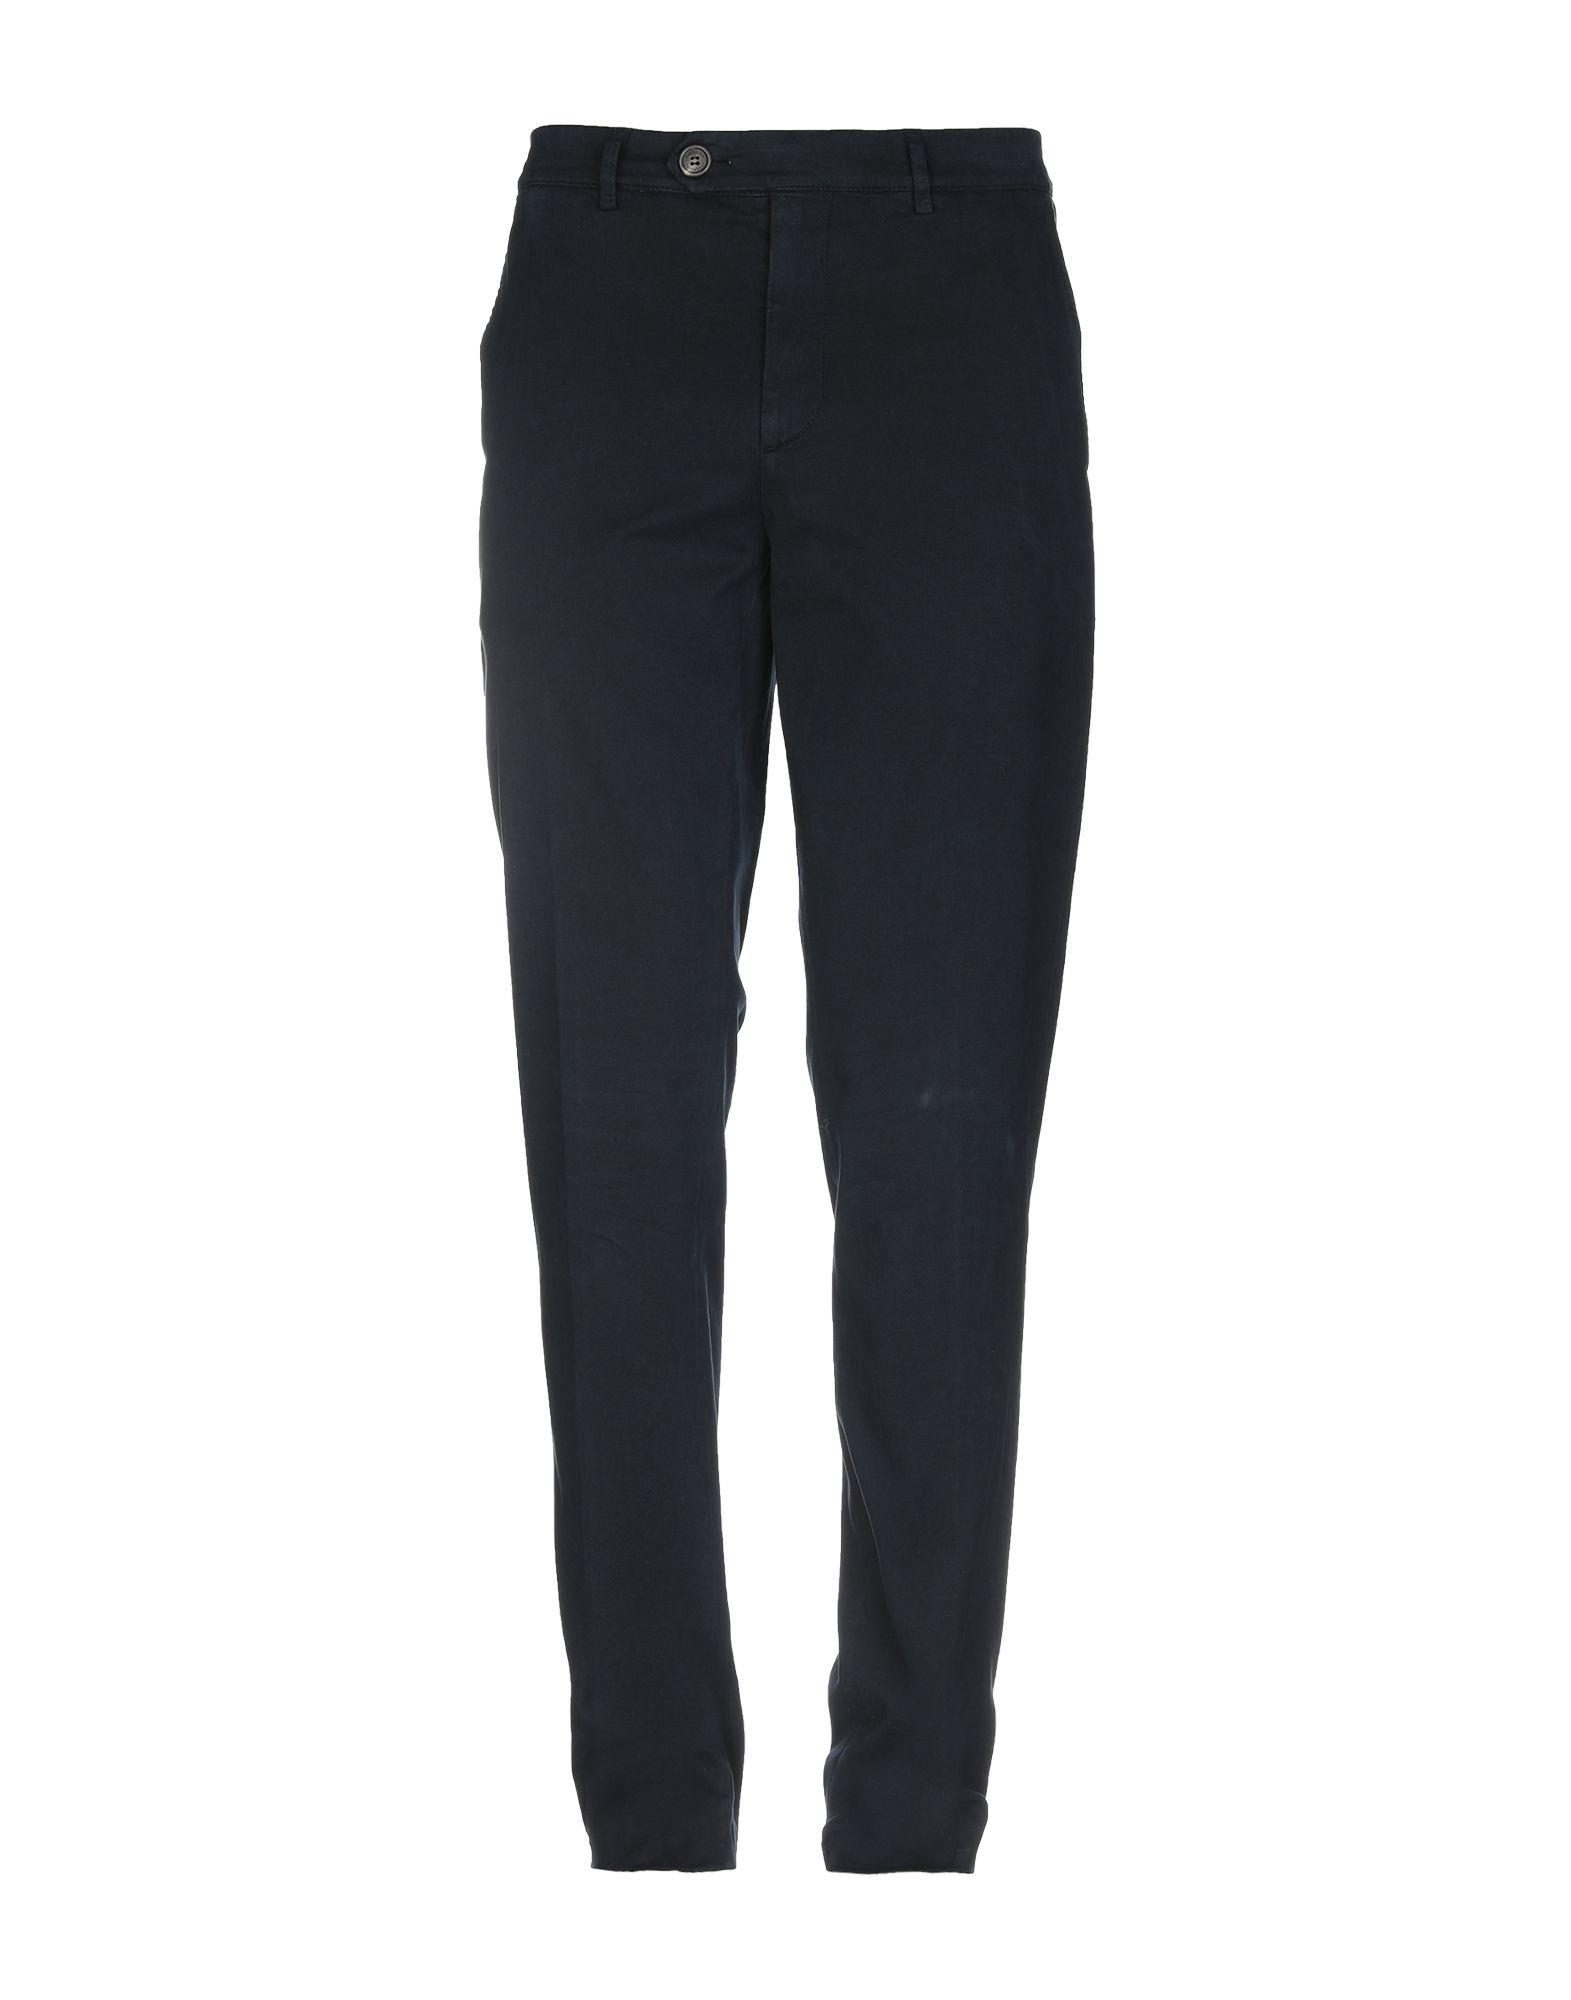 BRUNELLO CUCINELLI Casual pants. gabardine, no appliqués, basic solid color, mid rise, regular fit, straight leg, button, zip, multipockets, stretch, chinos. 97% Cotton, 3% Elastane